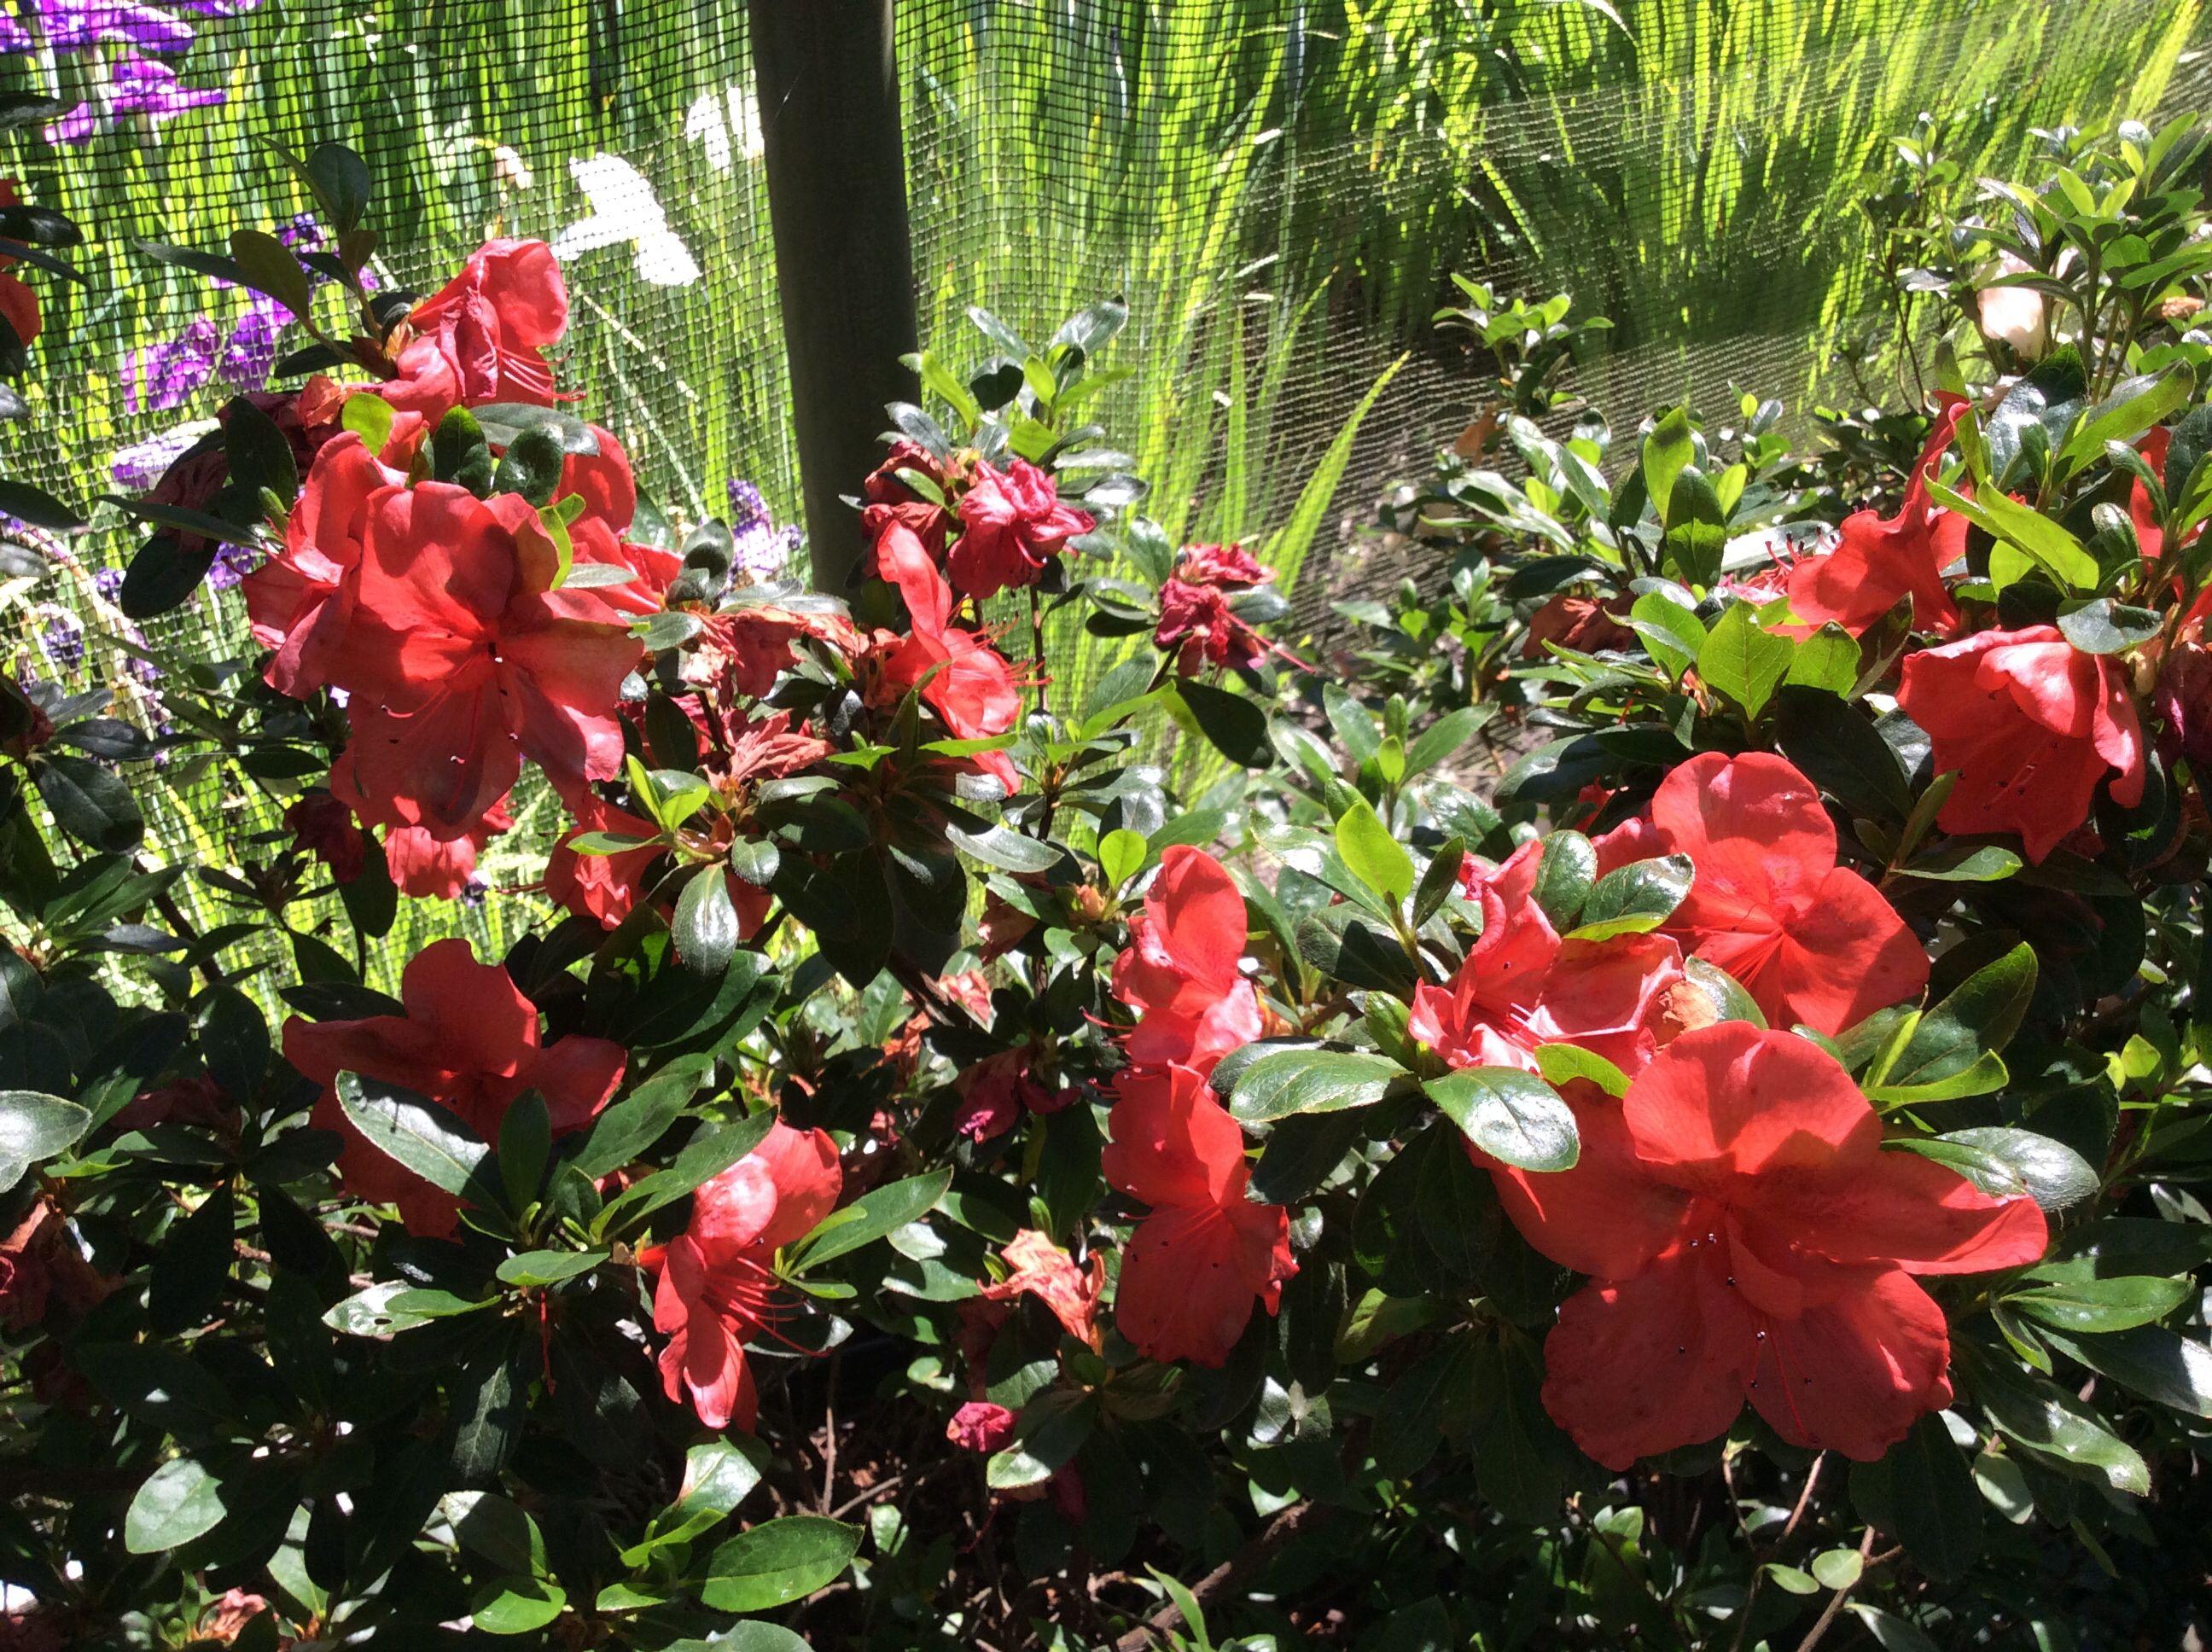 Ama Ghasa Azalea Sonomahort Sonoma Horticultural Nursery Sebastopol Ca Http